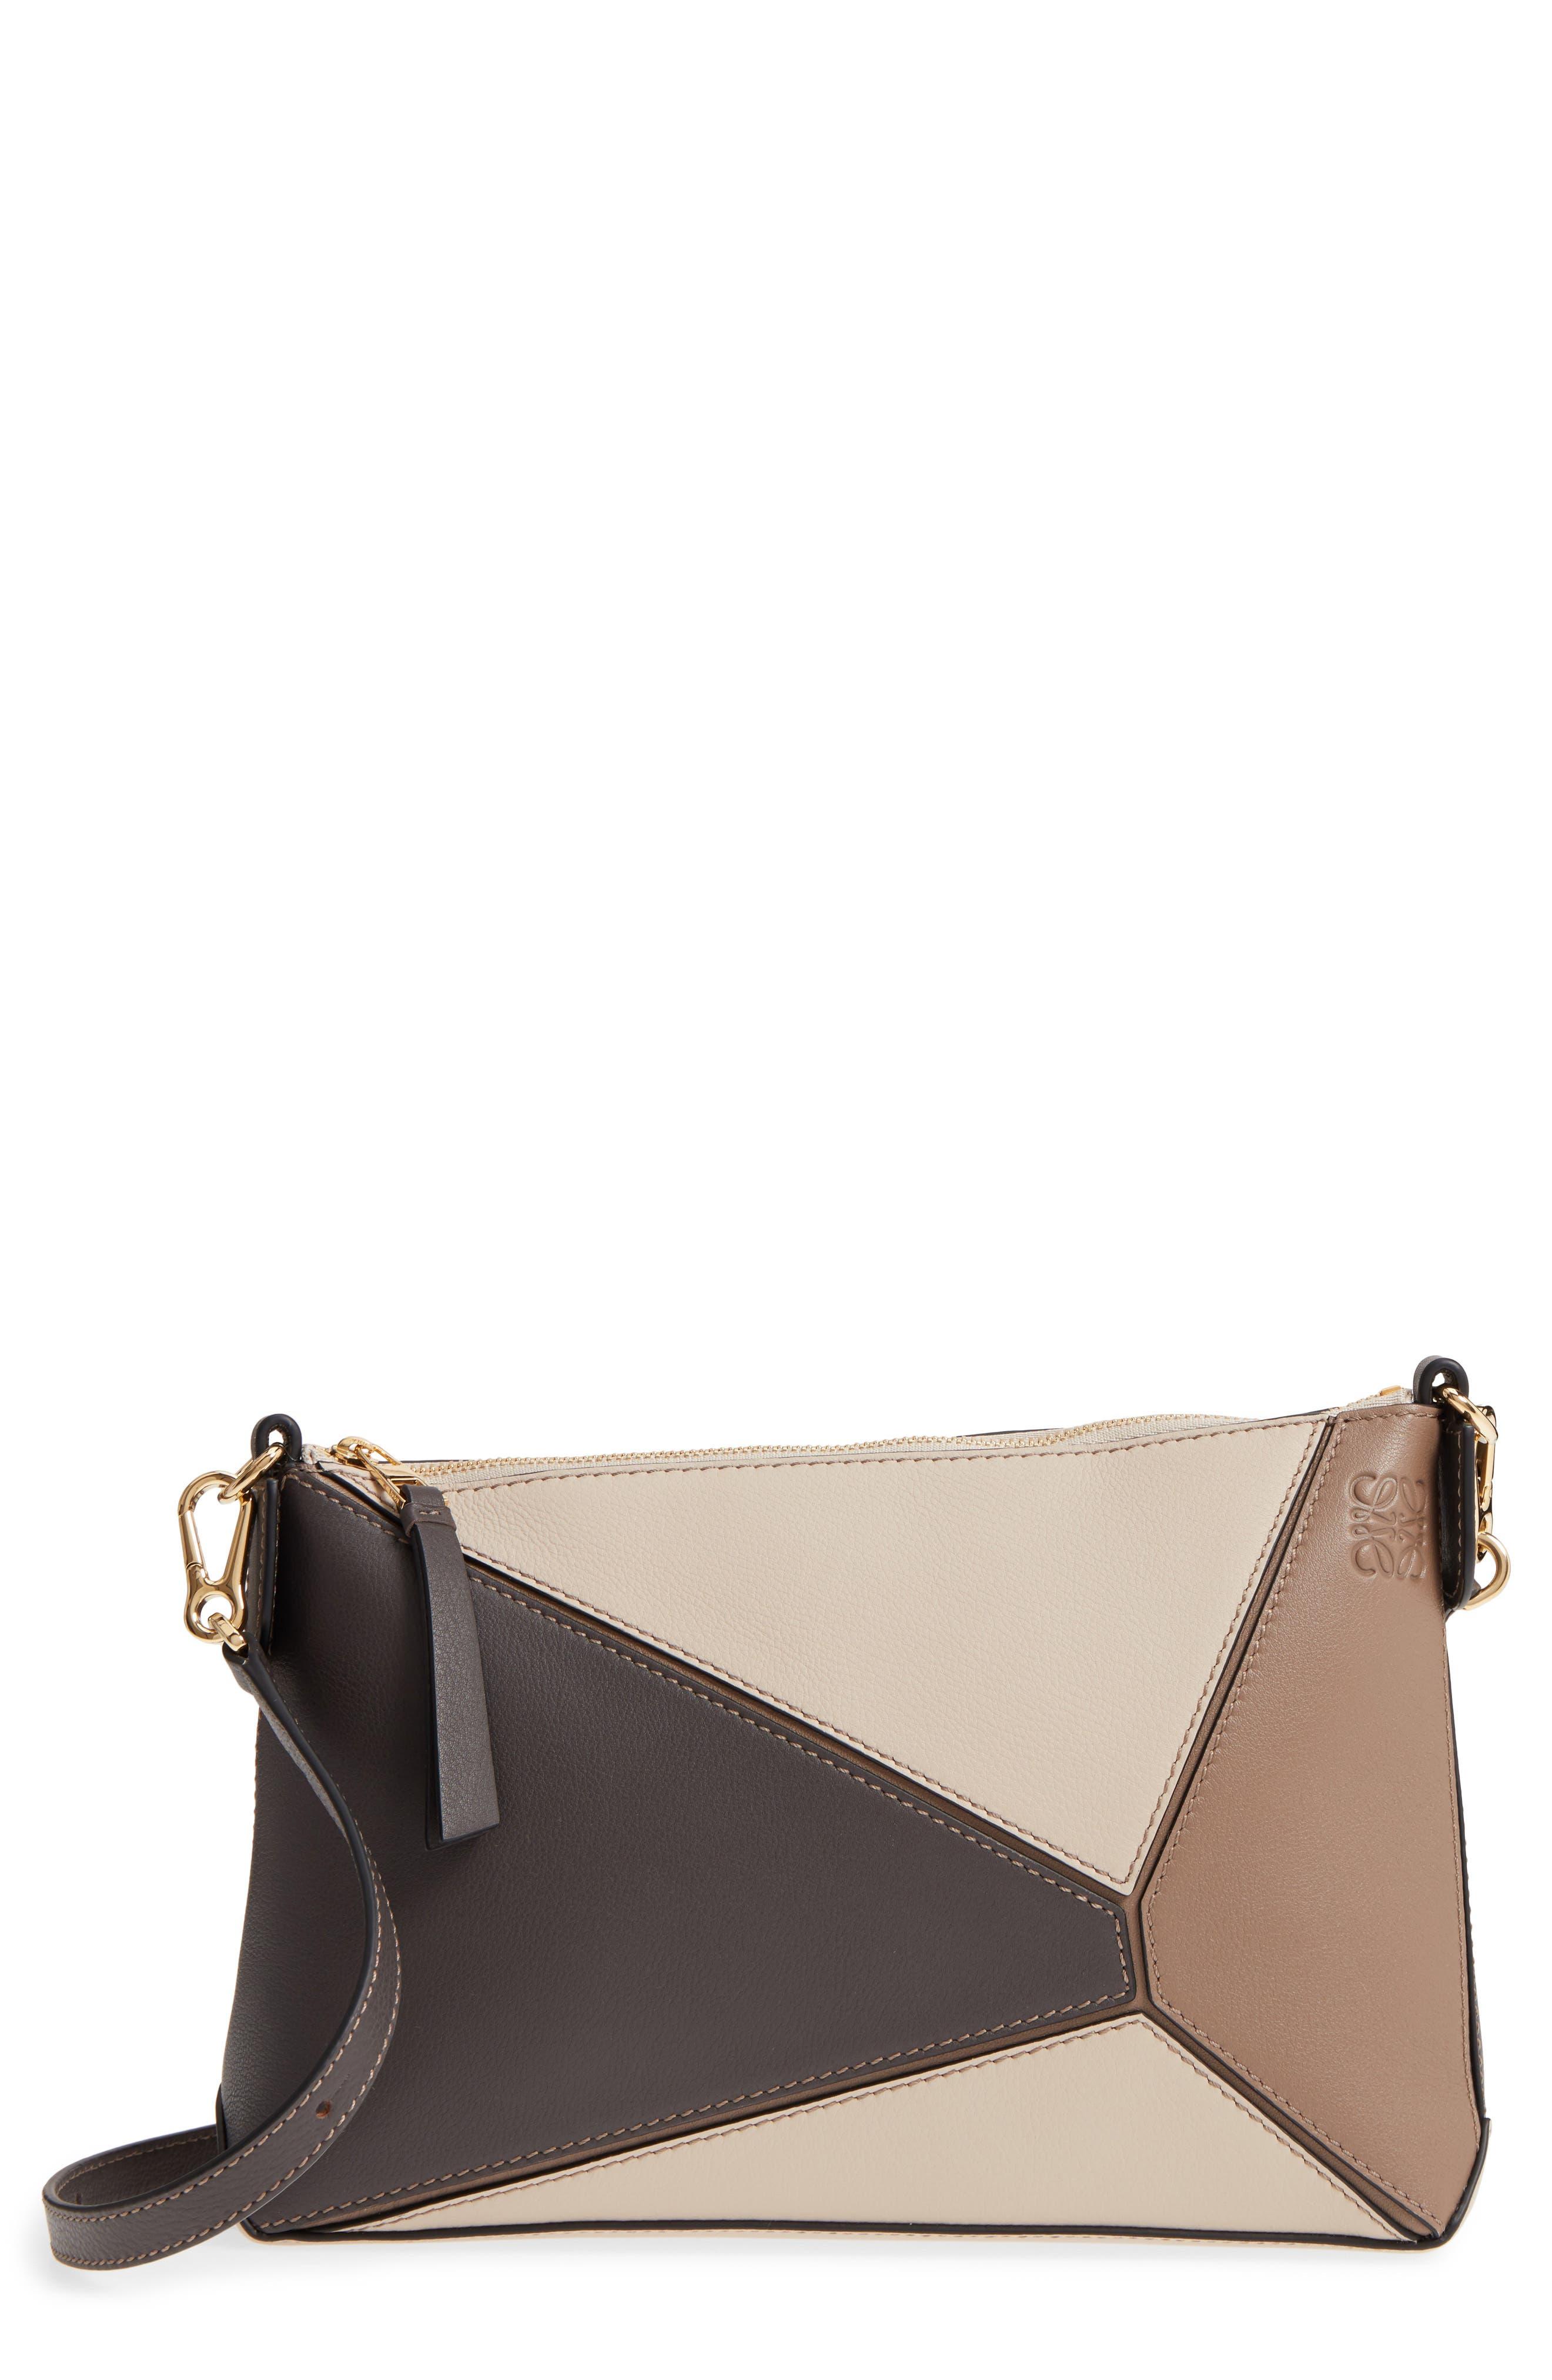 Loewe Mini Puzzle Calfskin Leather Crossbody Bag